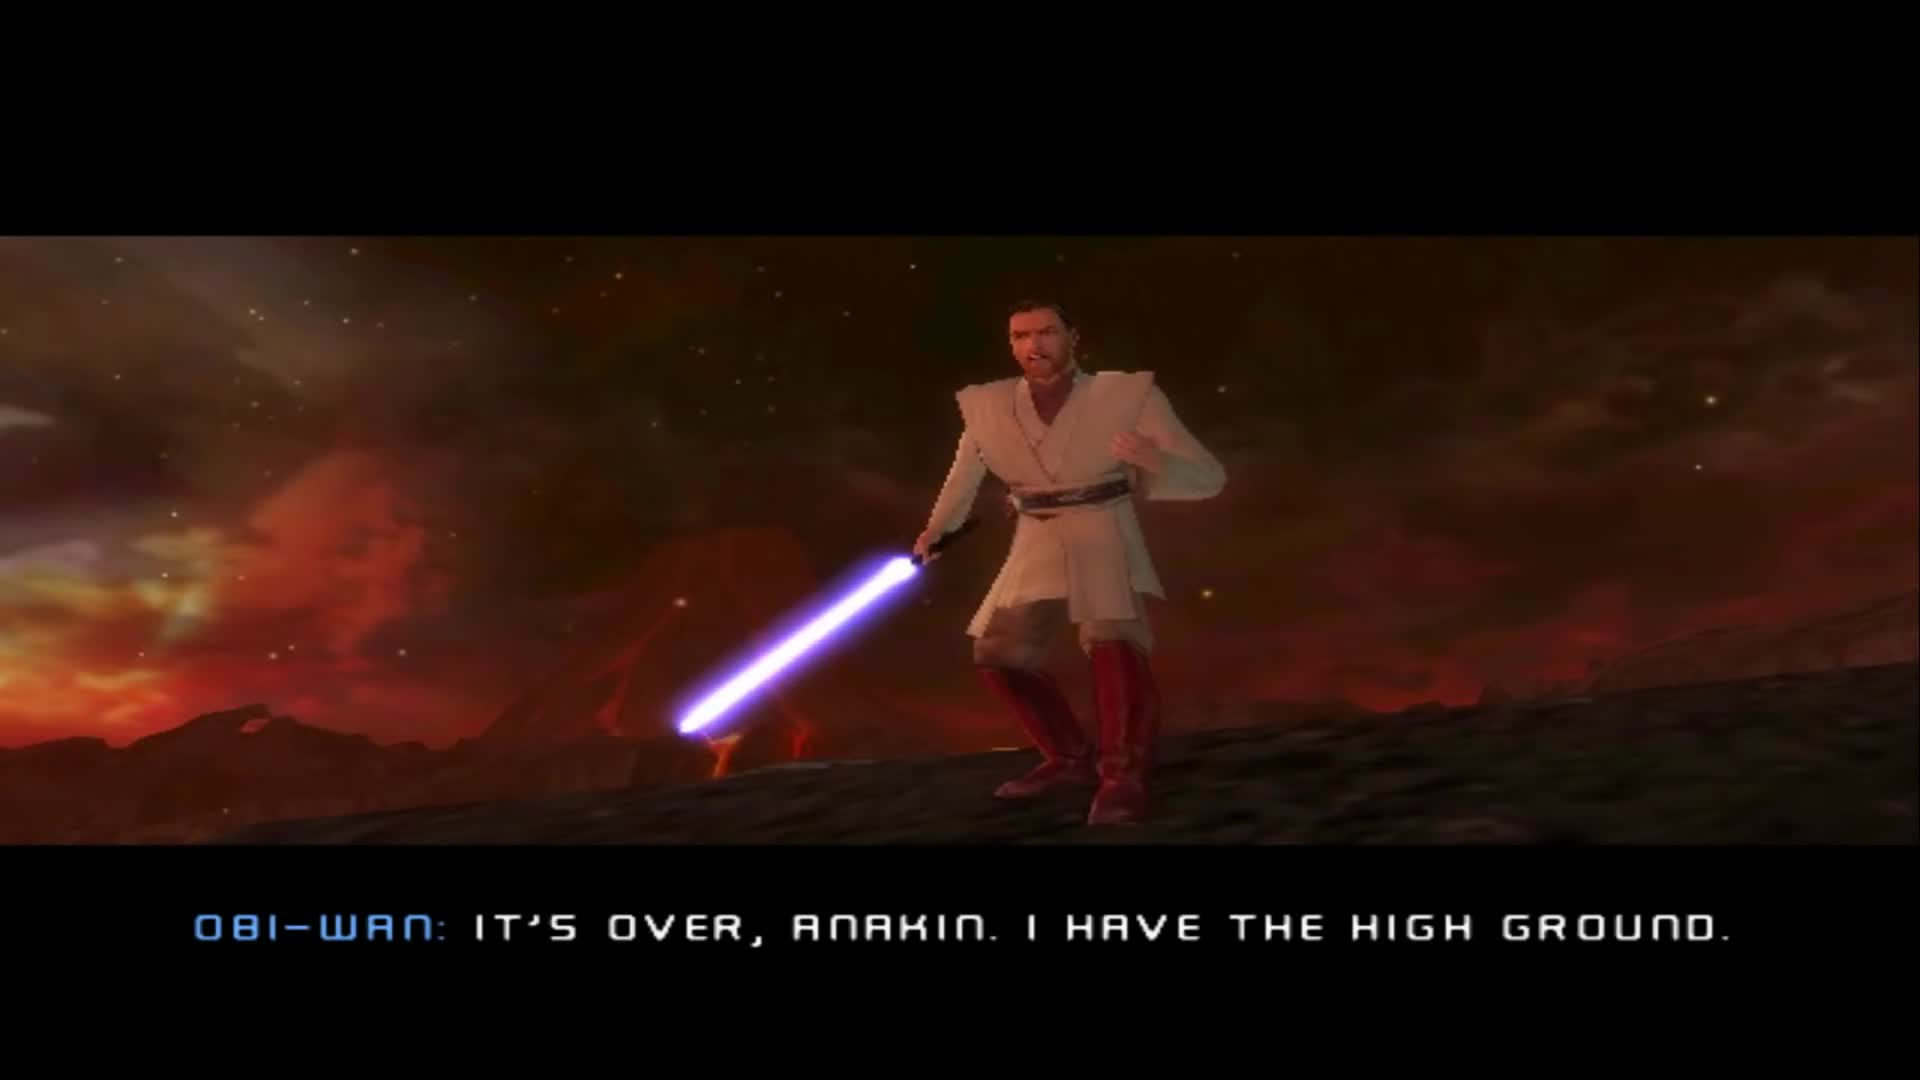 Revenge Of The Sith Ps2 Alternate Ending Anakin Kills Obi Wan Gif By Vistalg Gfycat